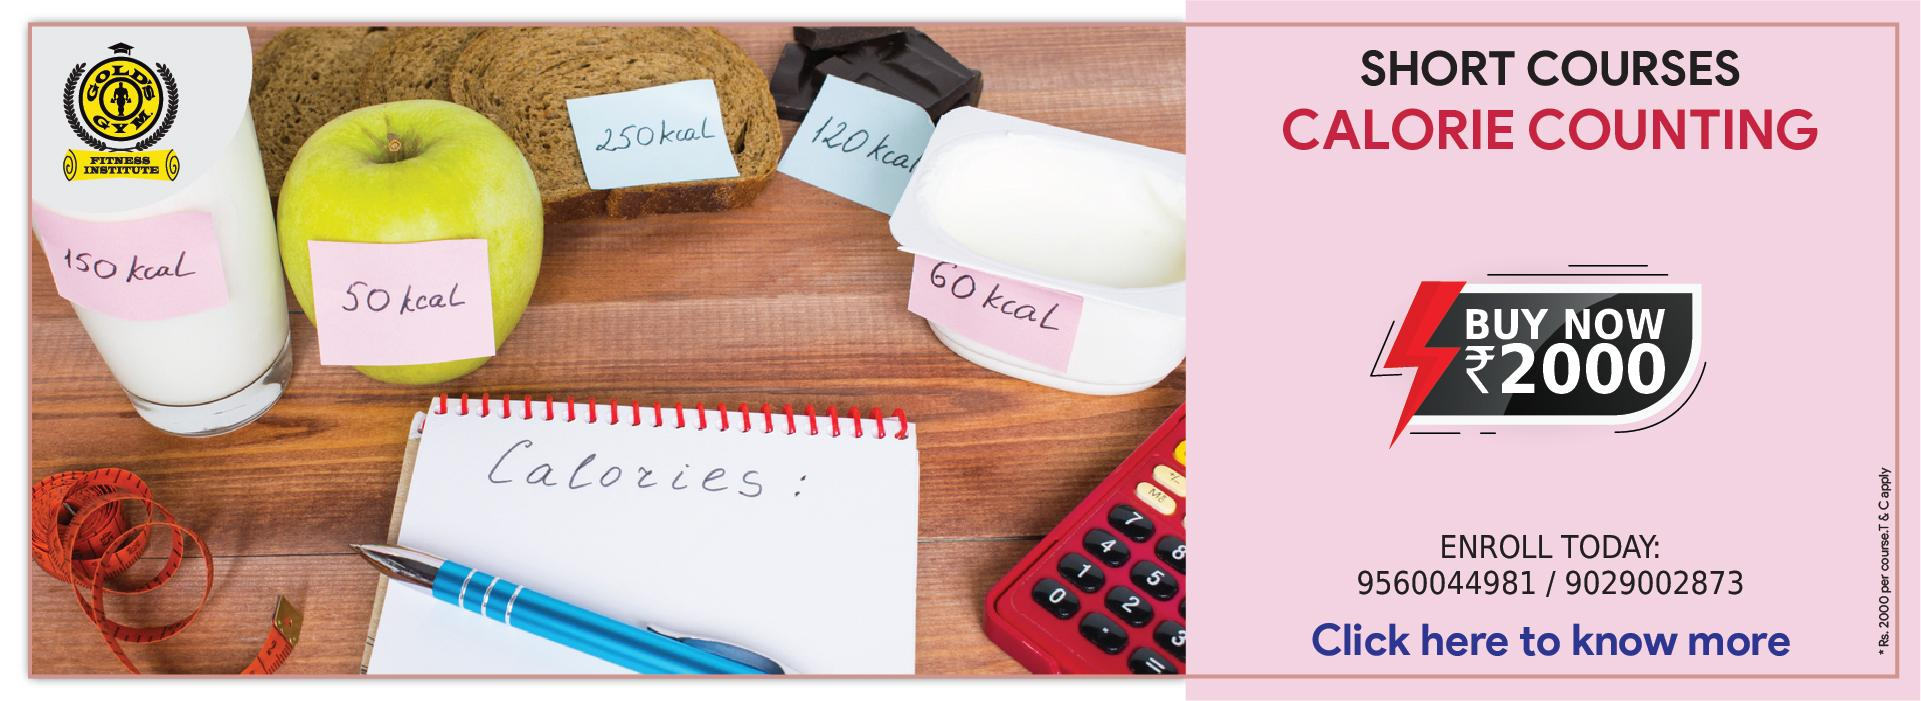 GGFI Short Course - Calories Counting